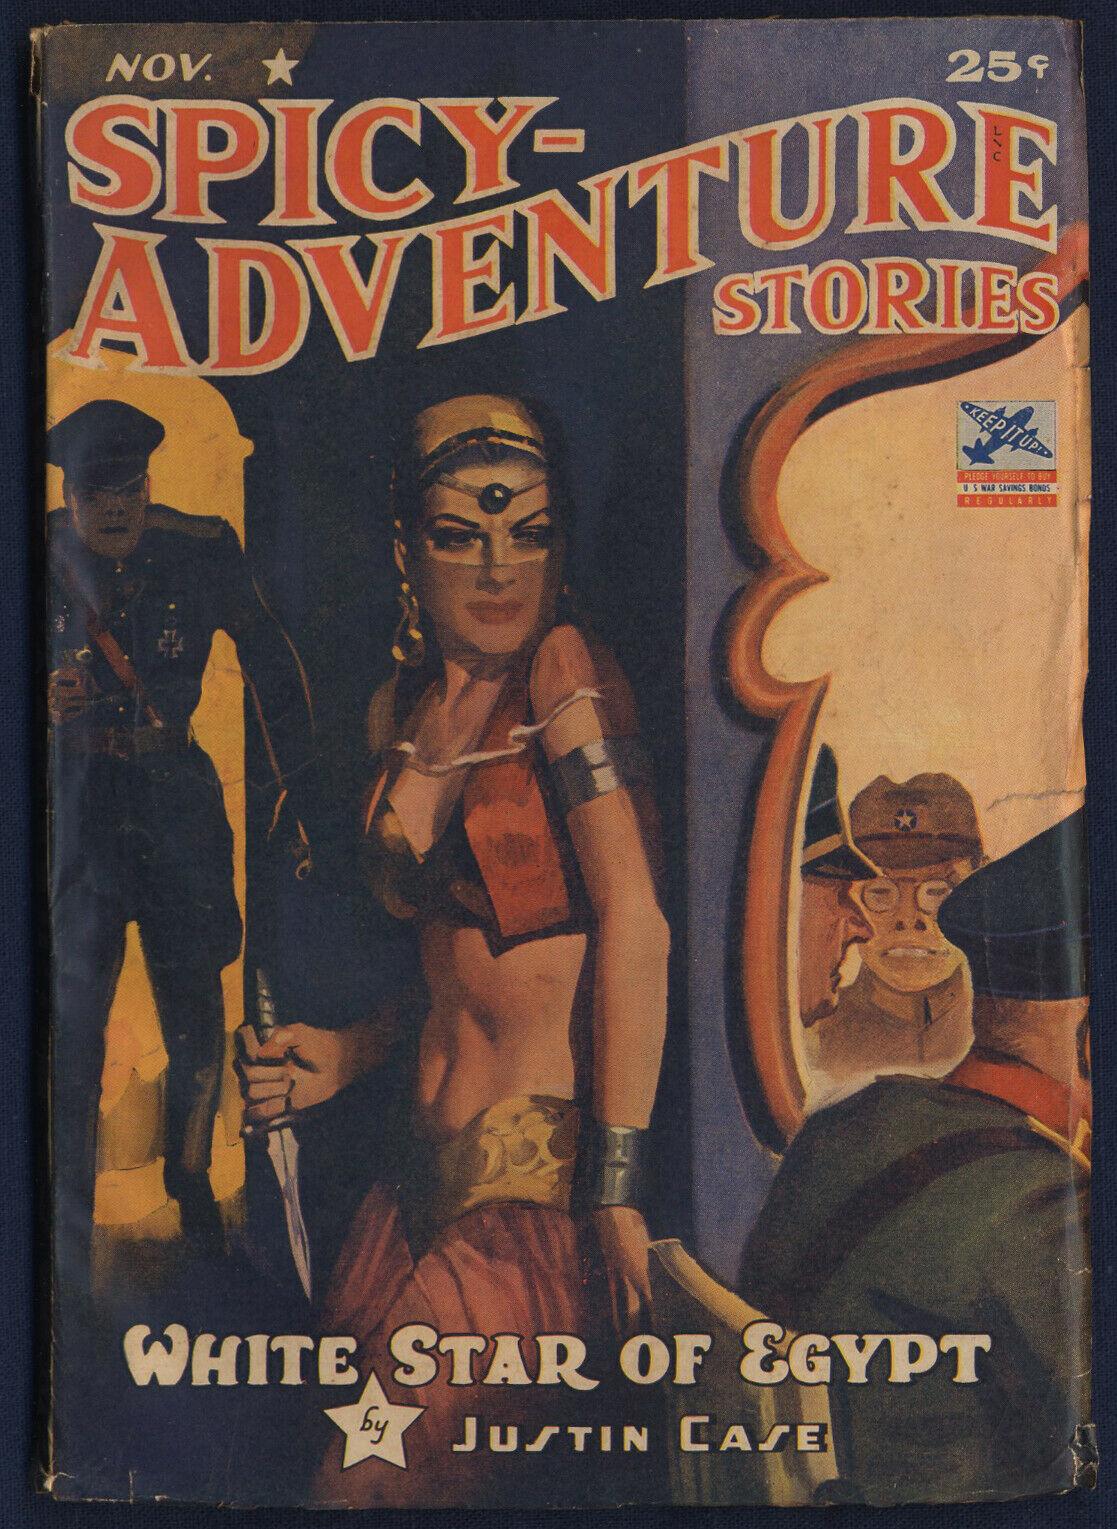 Spicy Adventure Stories - November 1942